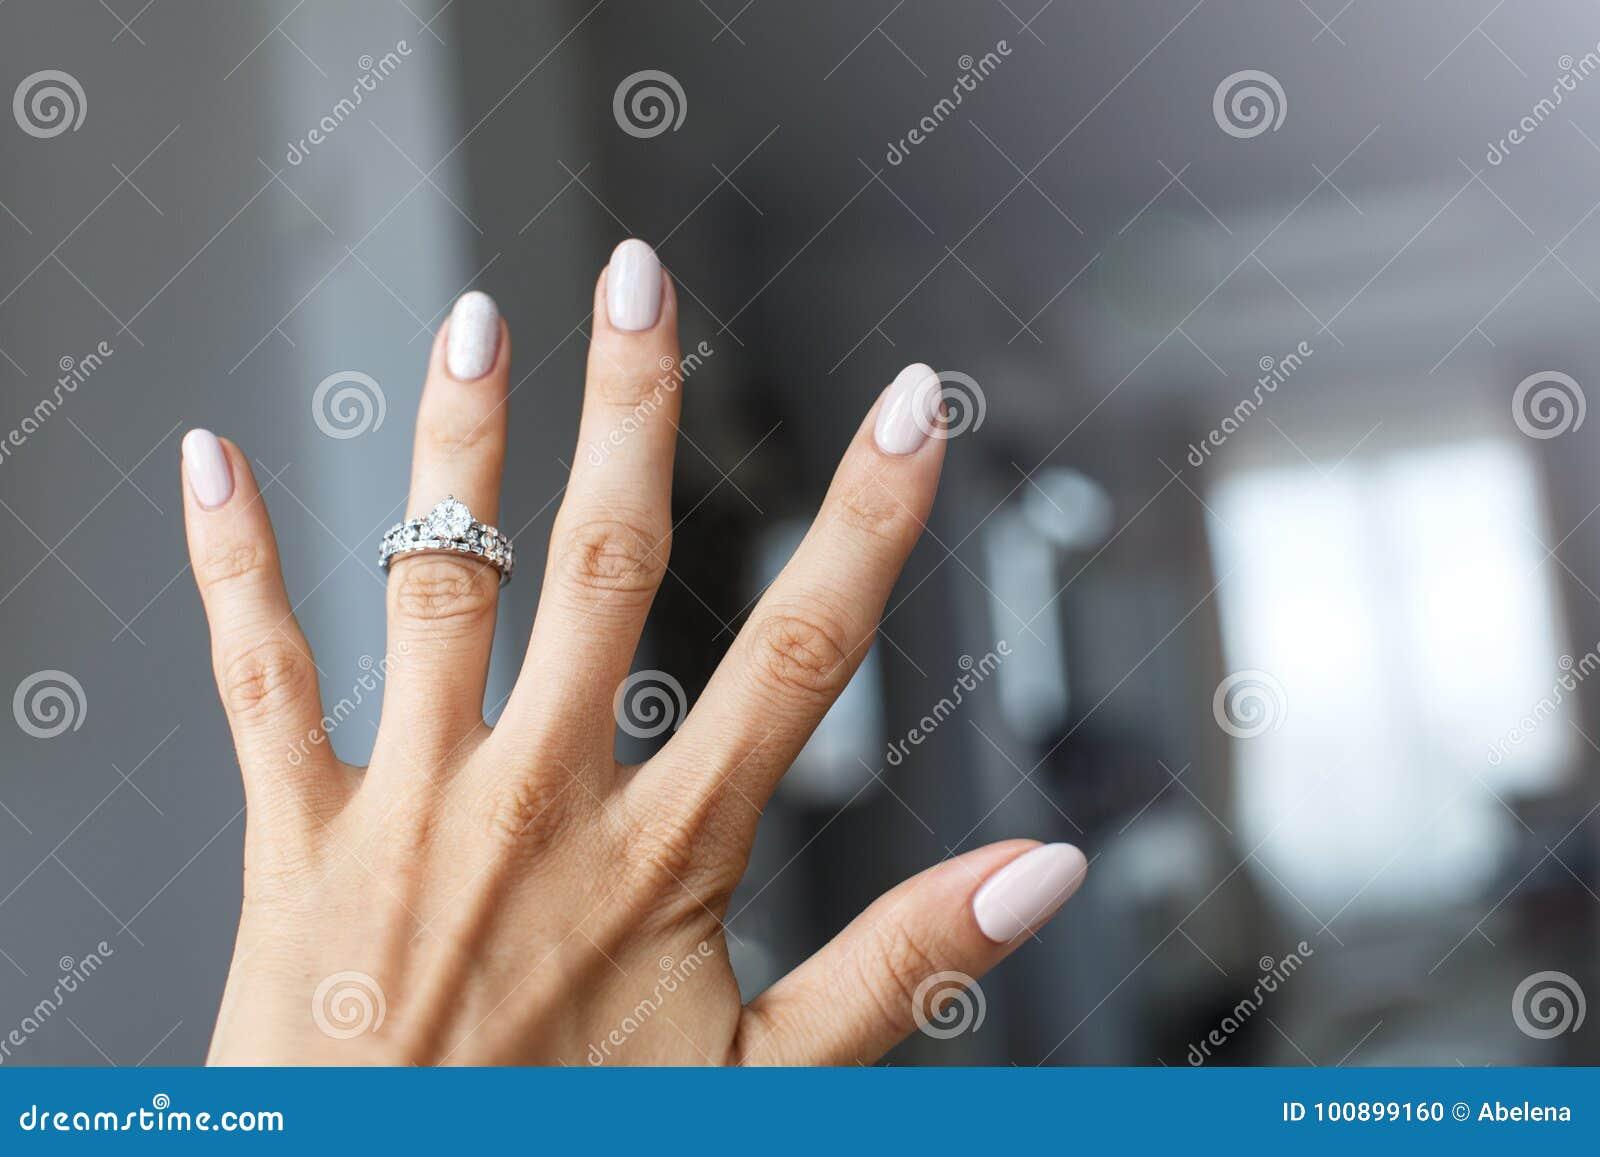 Which Hand Wedding Ring Female.Beautiful Female Hand With Elegant Diamond Ring Stock Photo Image